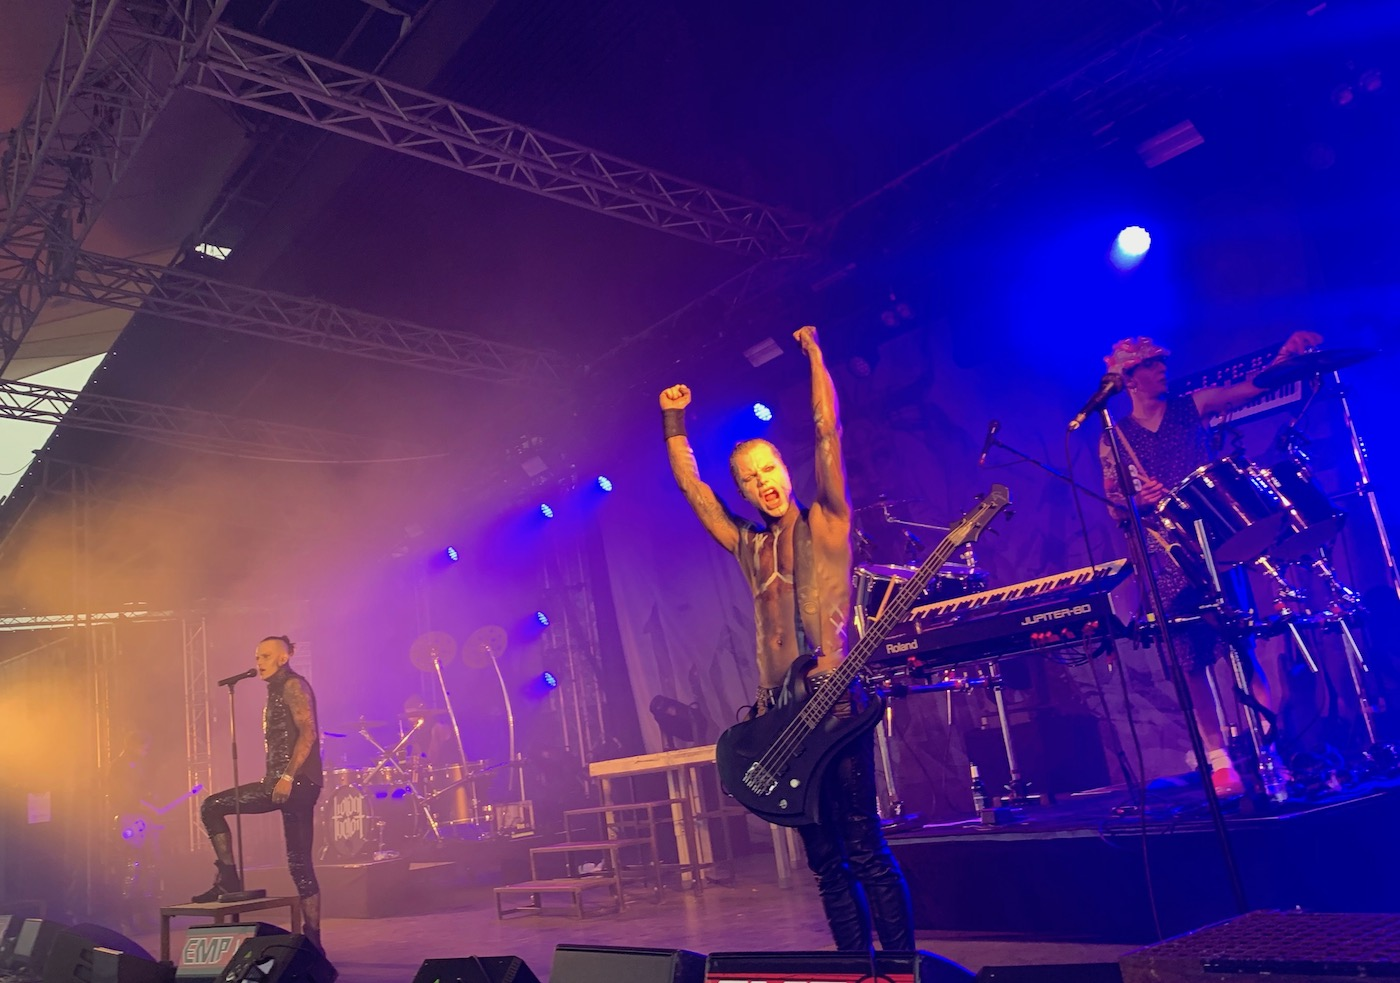 mark_benecke_amphi_festival_koeln_2019 - 70.jpg